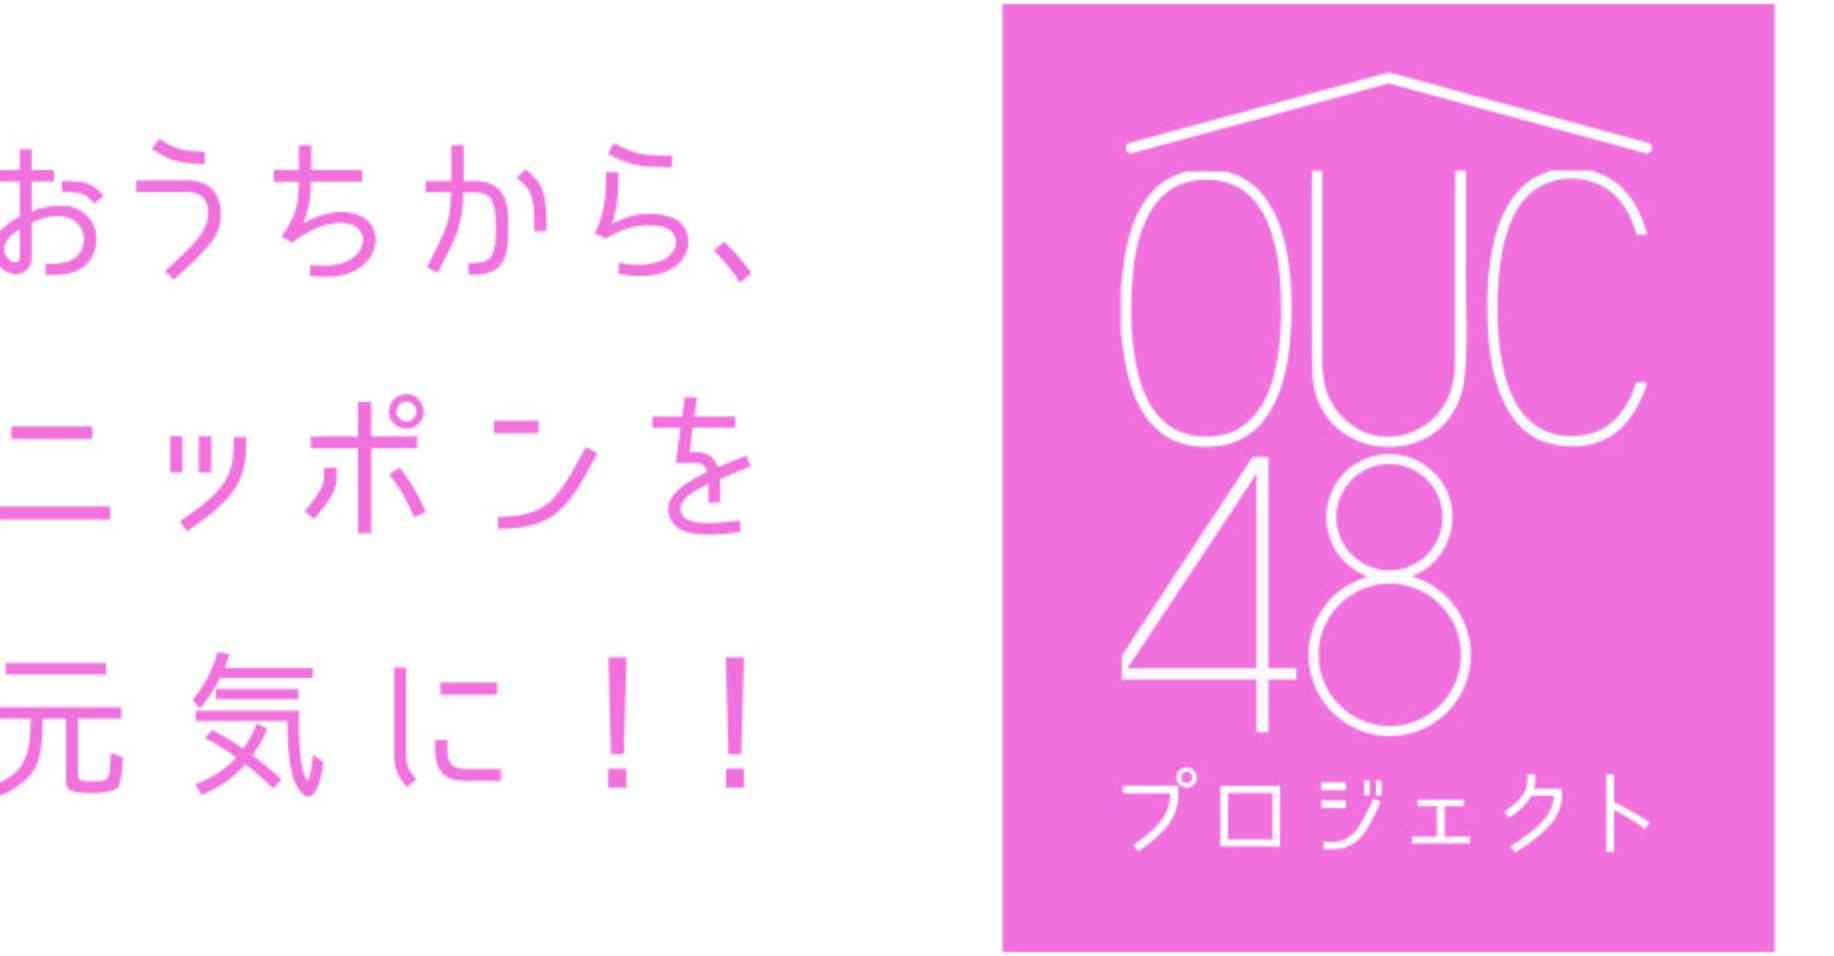 apa itu ouc48 ouchi adalah akb48